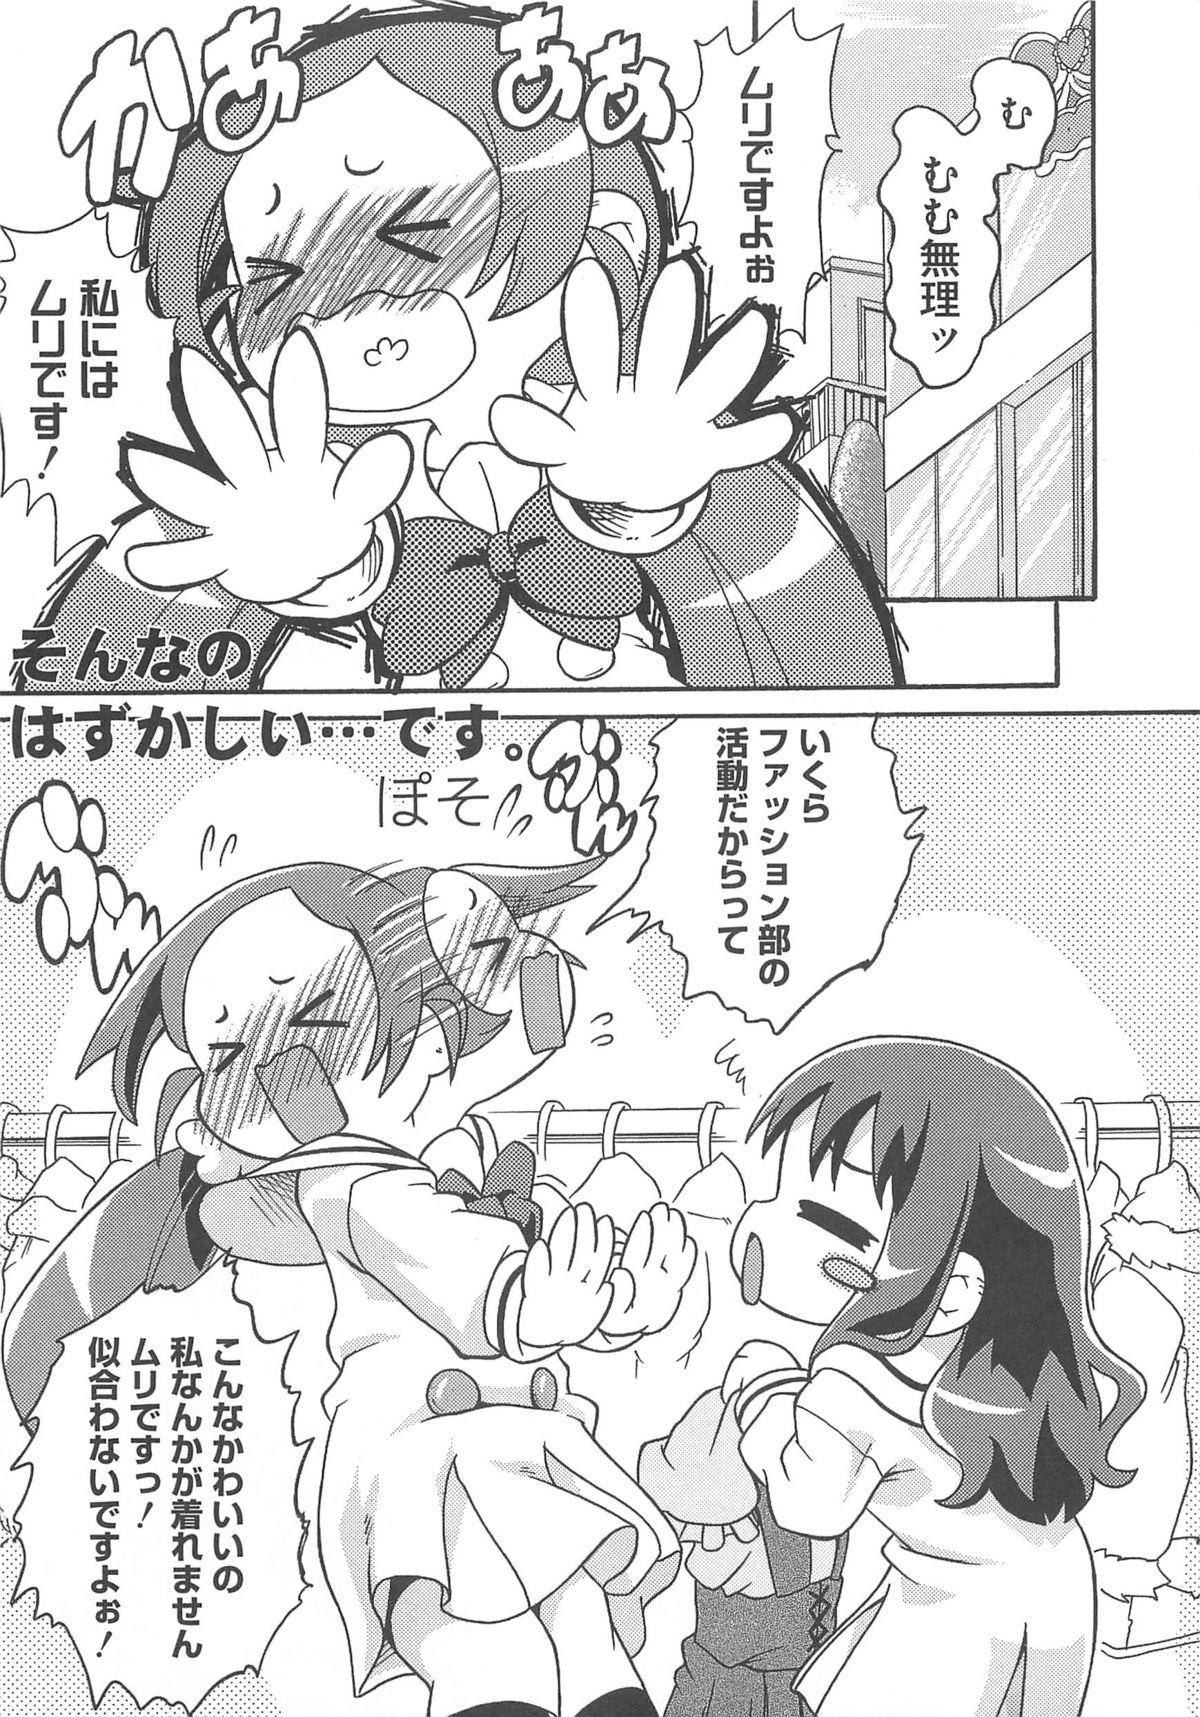 Cure Bitch Sakura!! HC 111